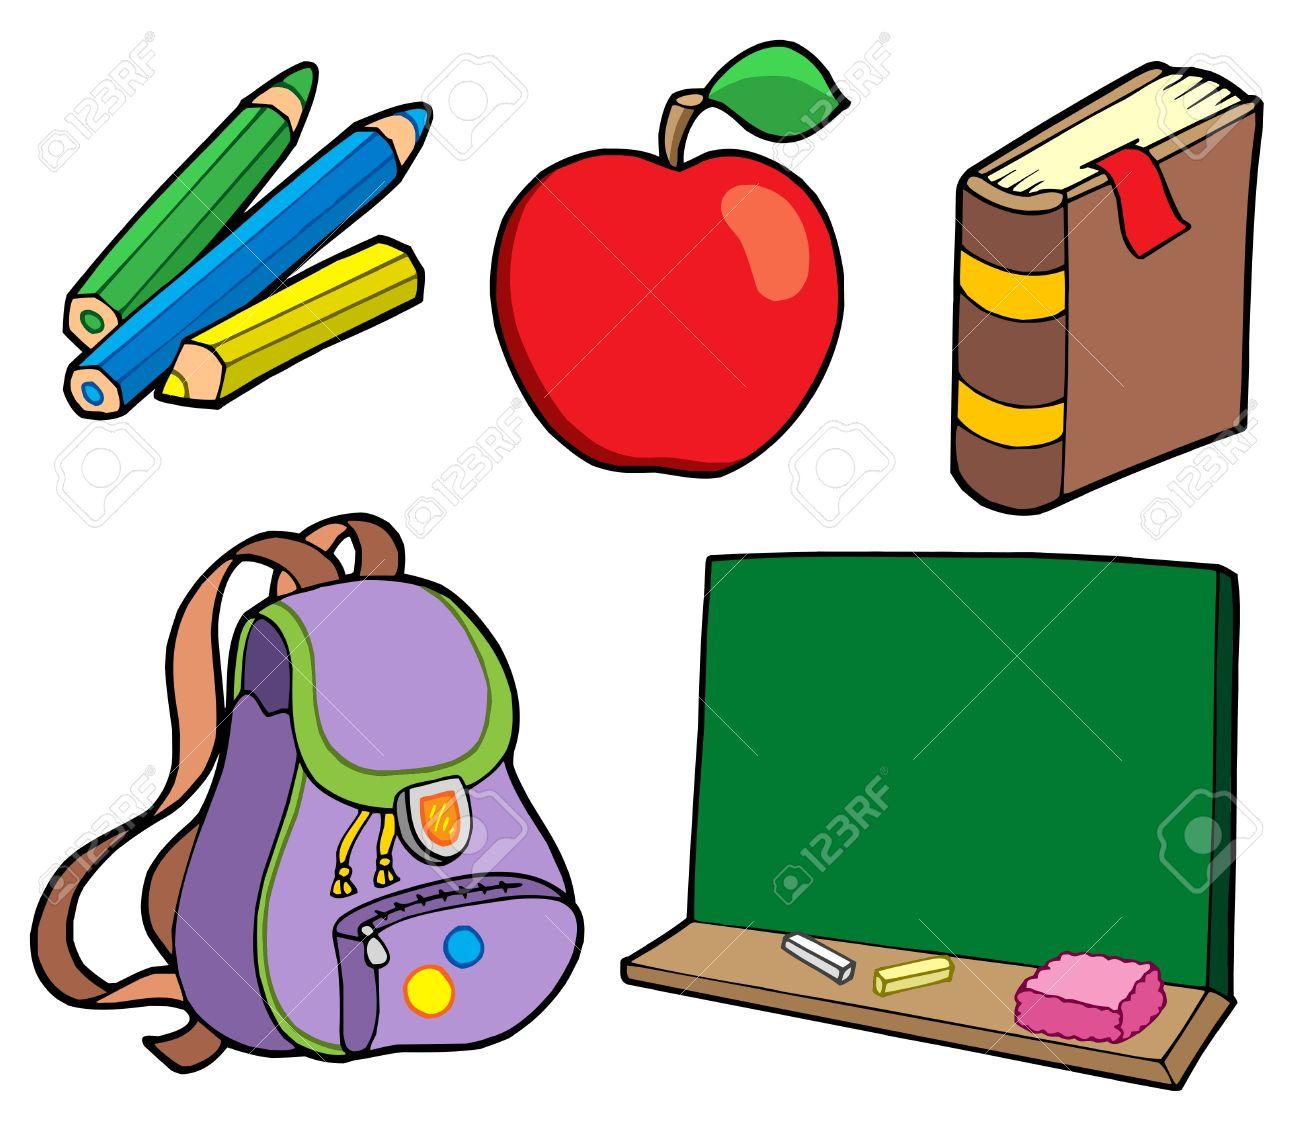 Coloring book bag - Book Bag Various School Items Vector Illustration